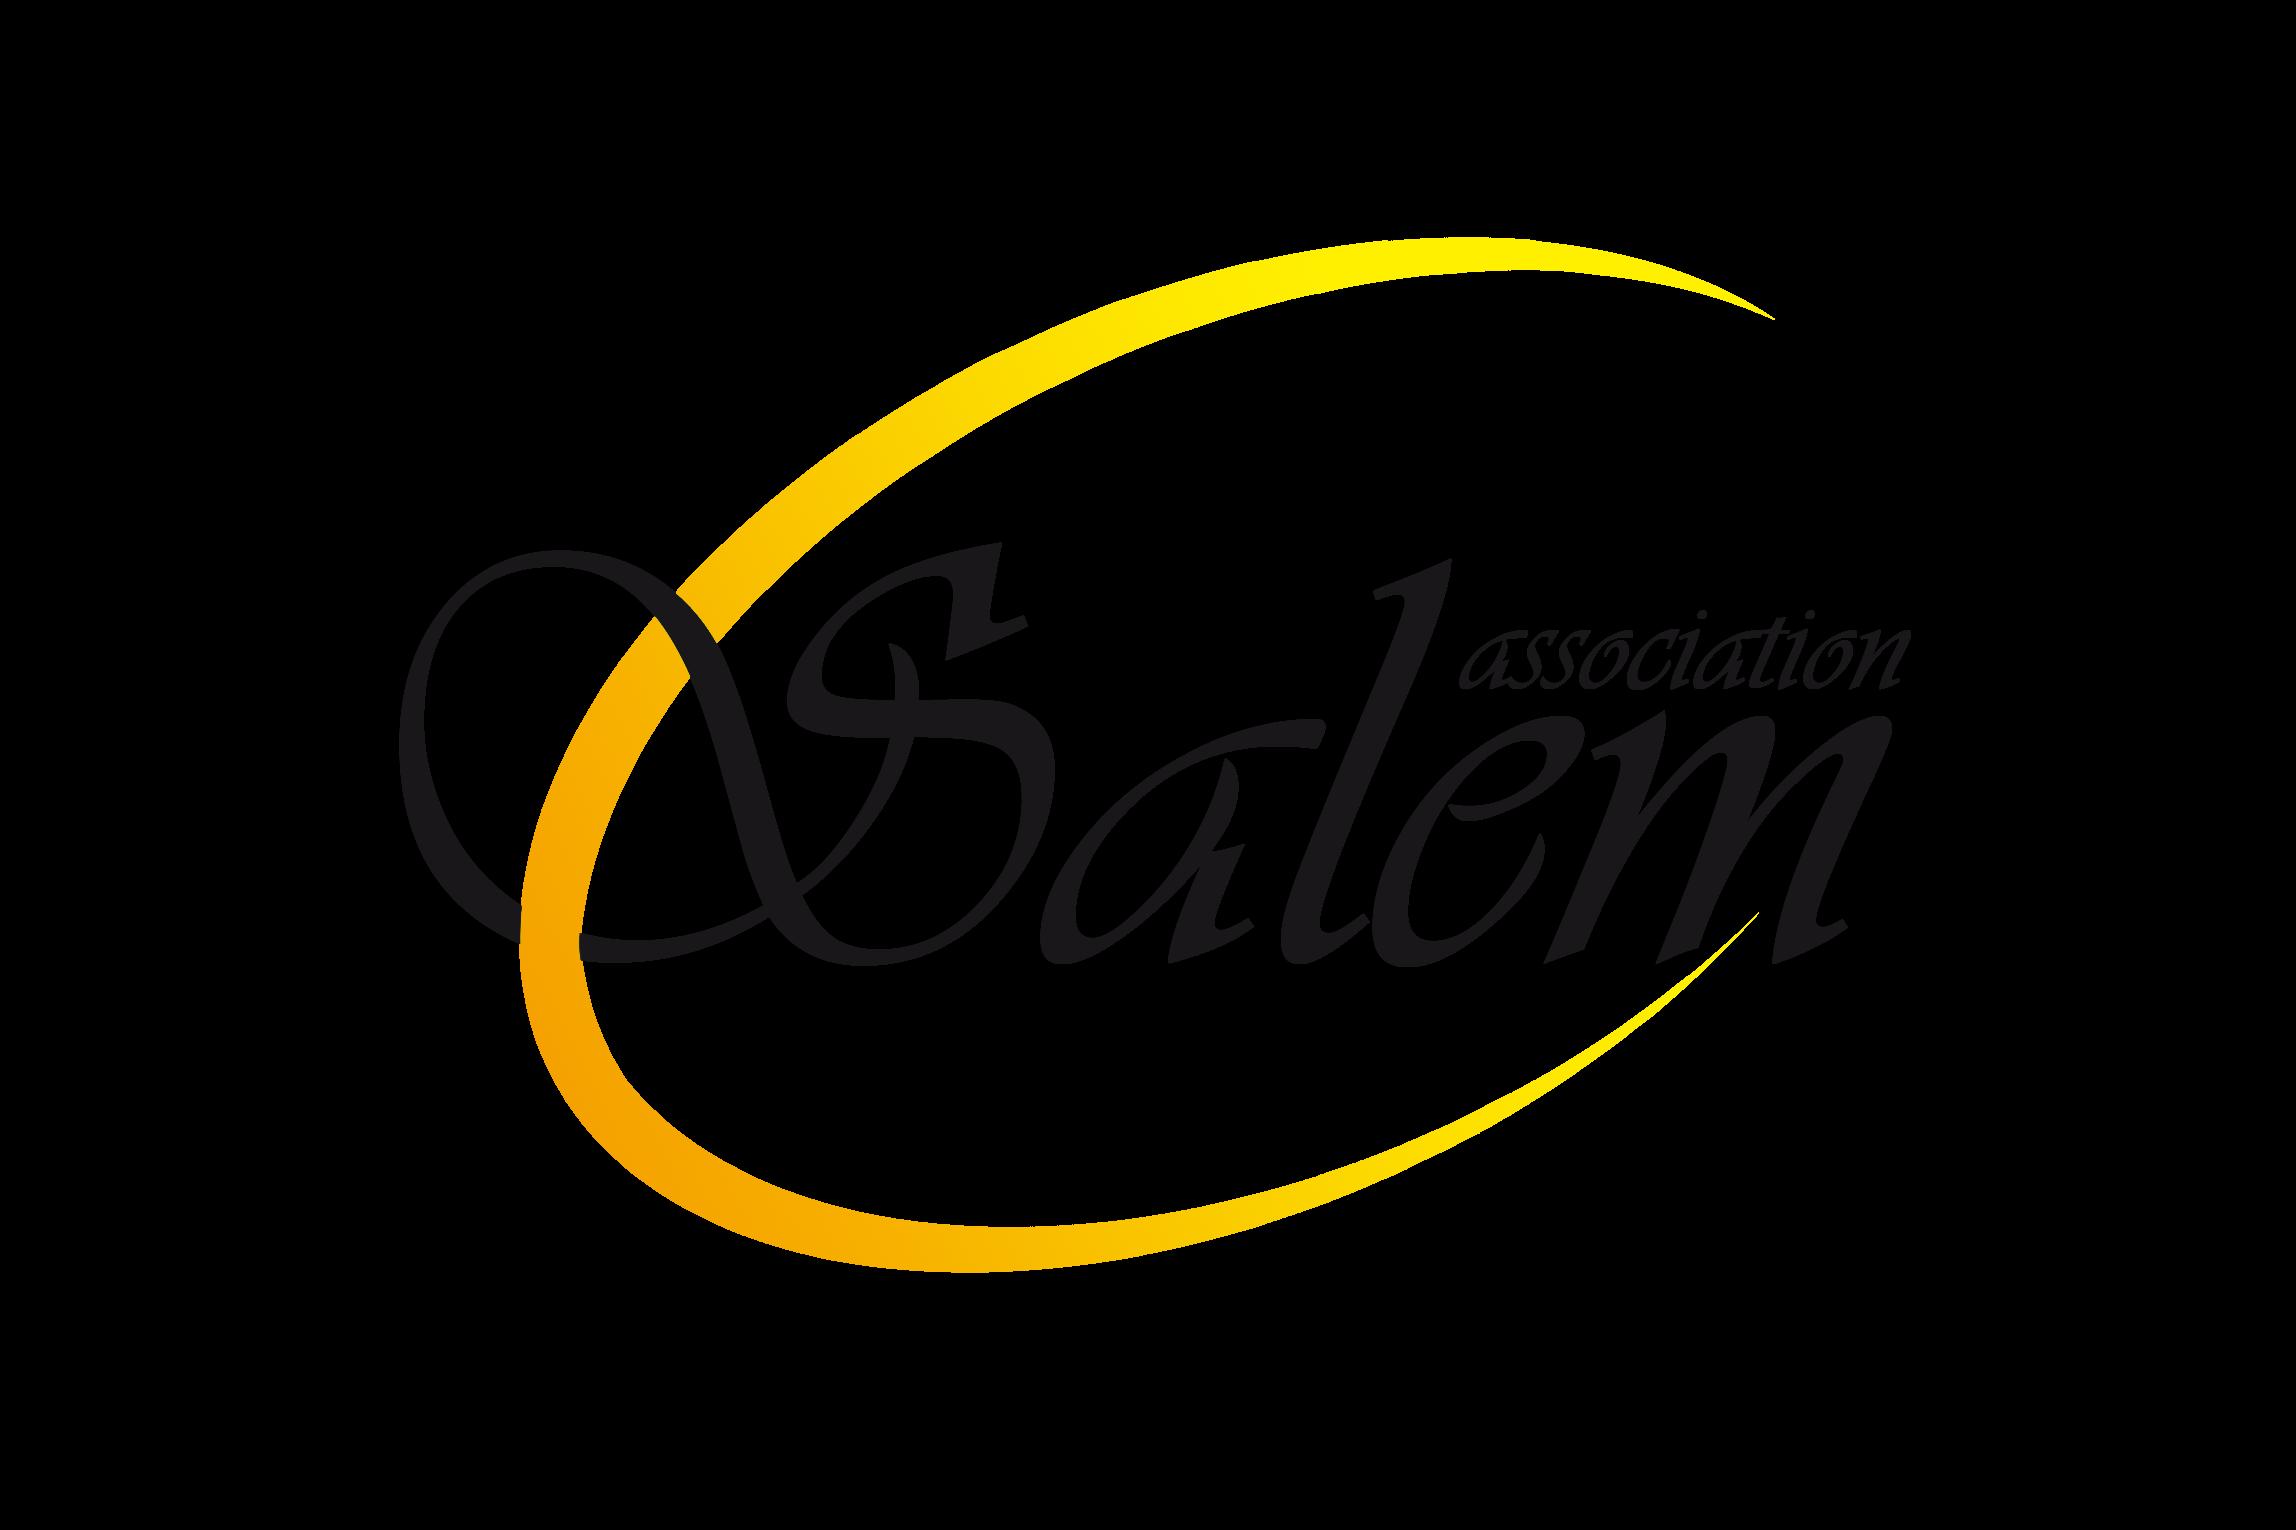 Association Salem